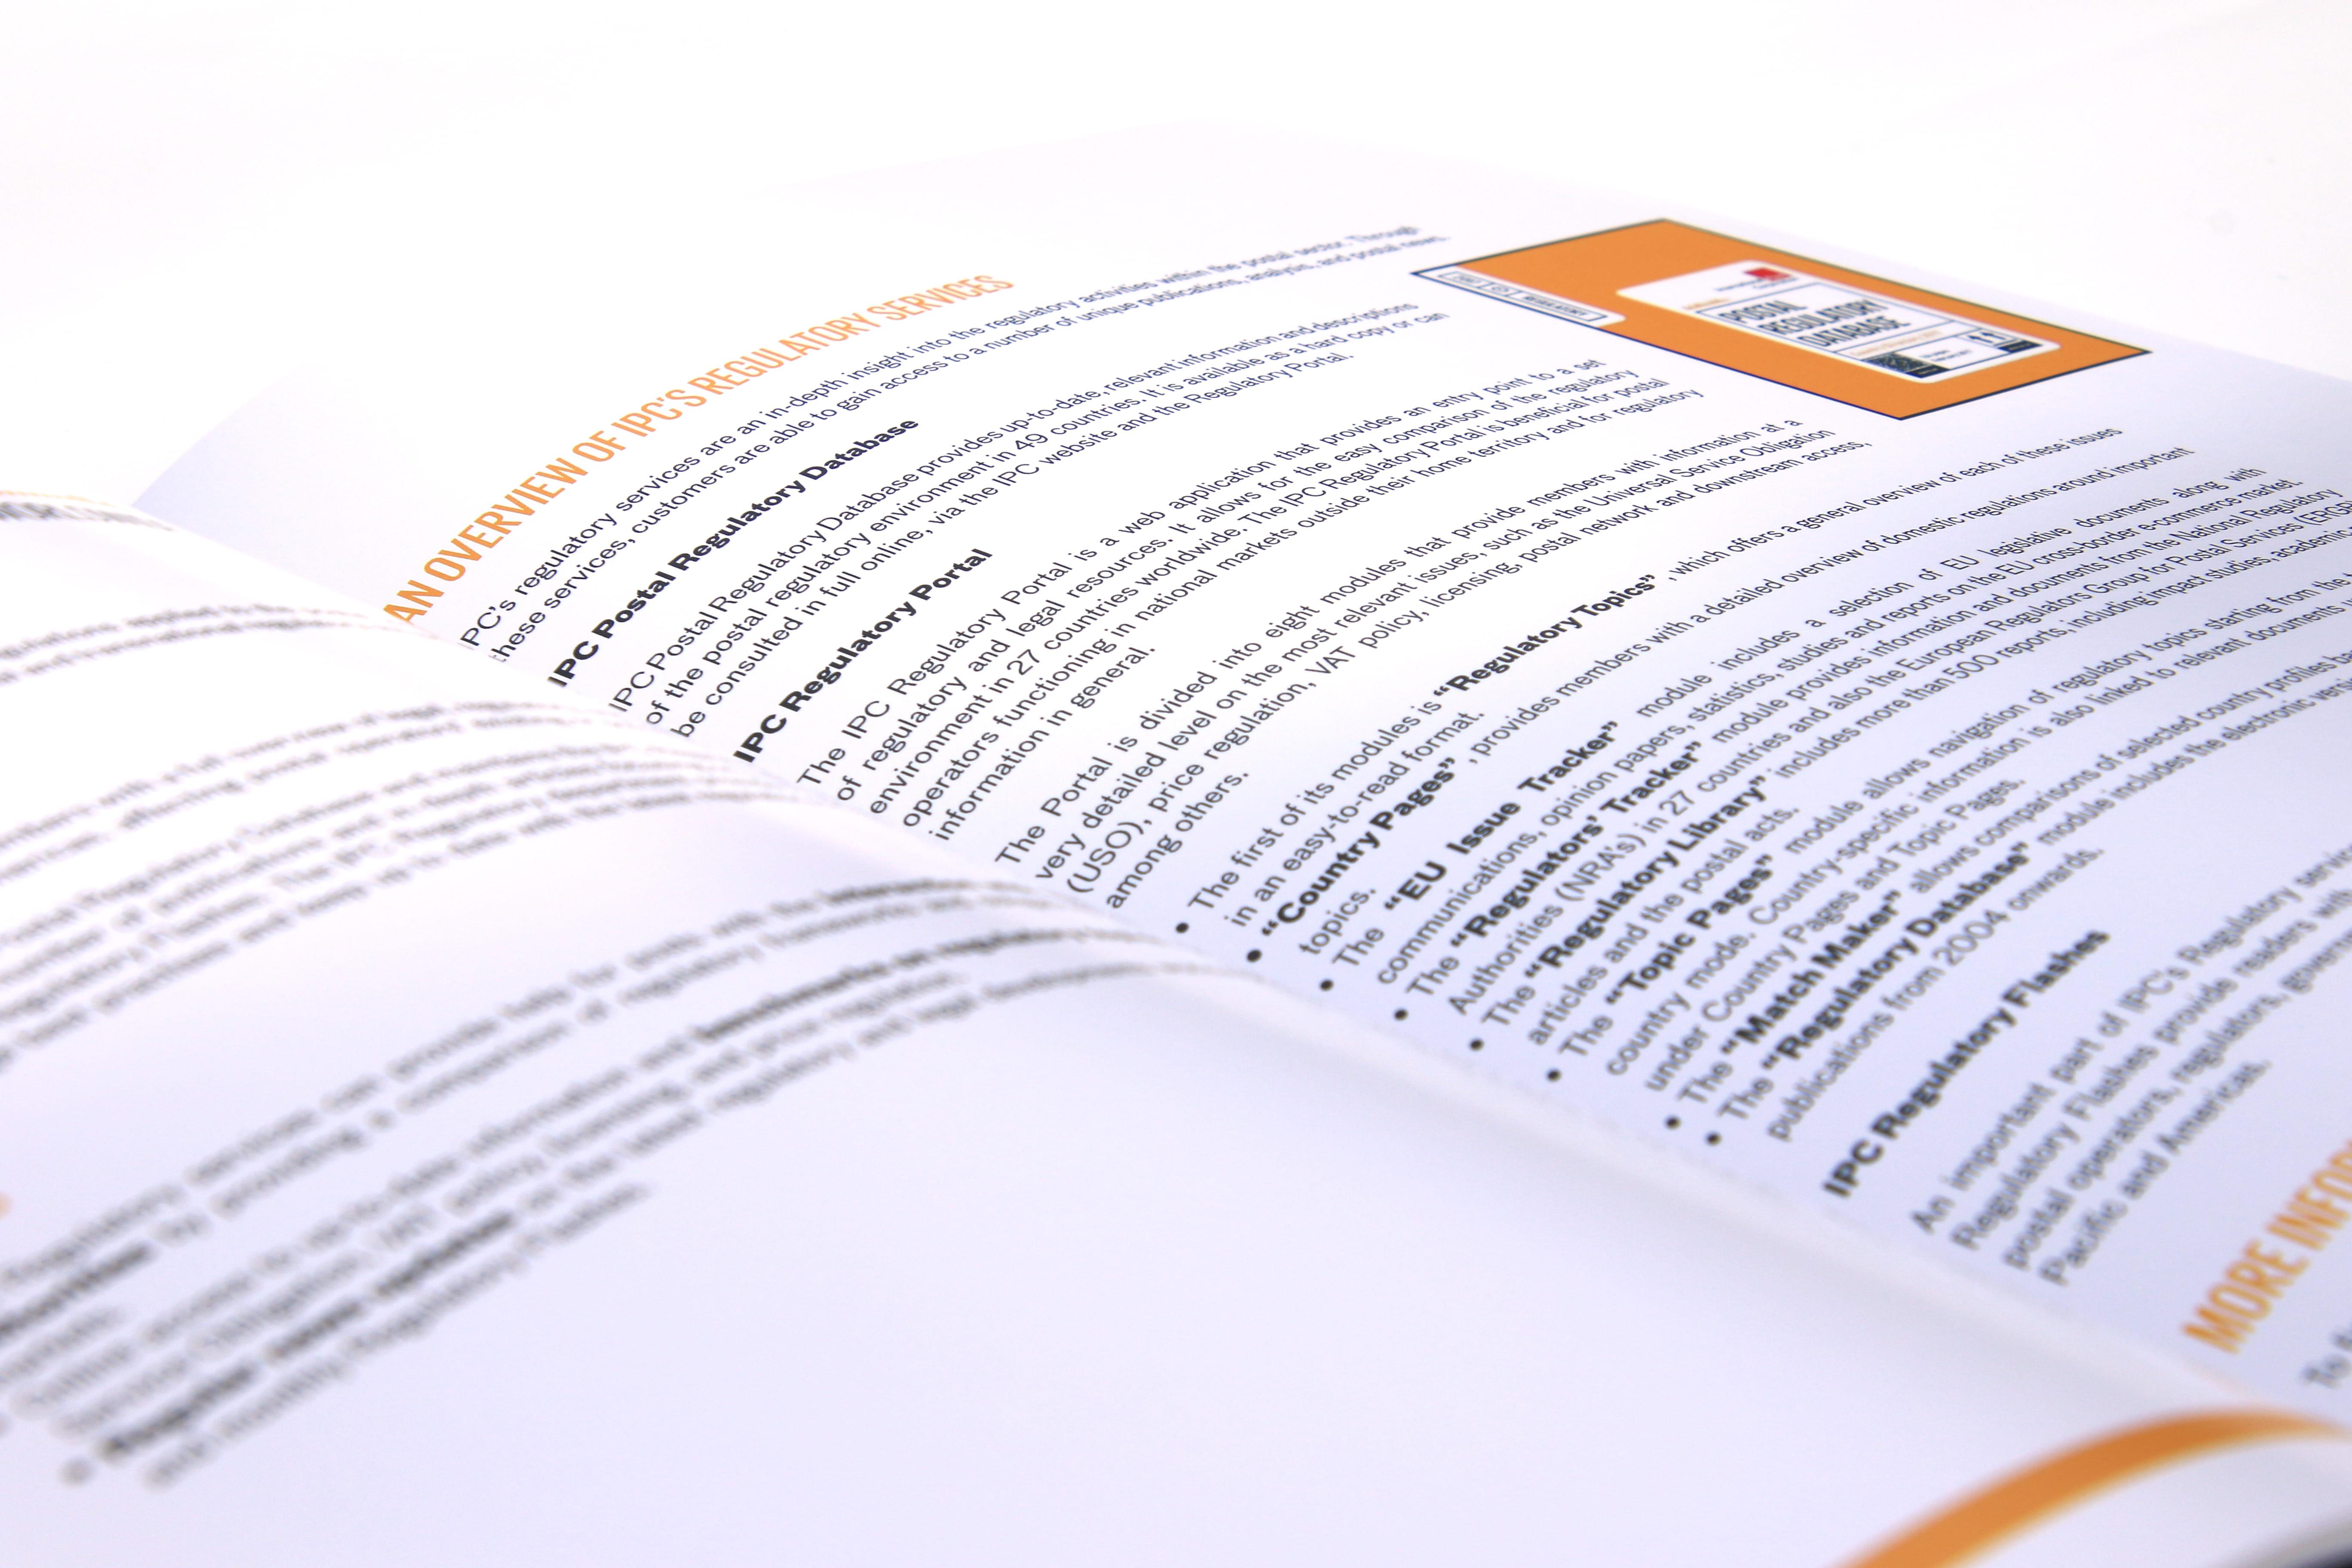 Regulatory Services | International Post Corporation